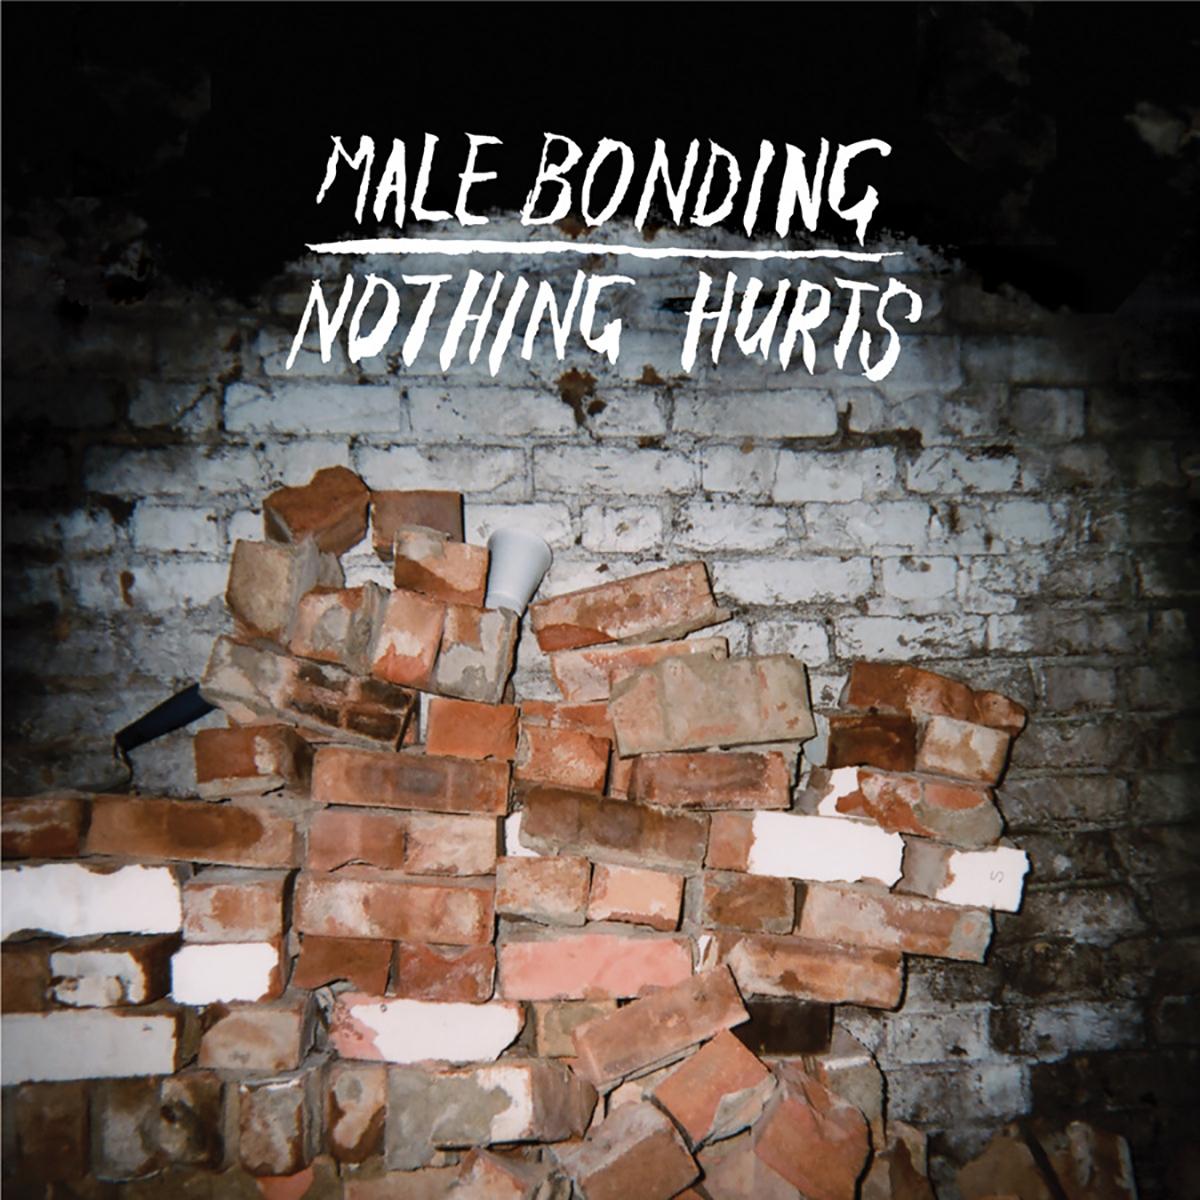 Male Bonding, Nothing Hurts